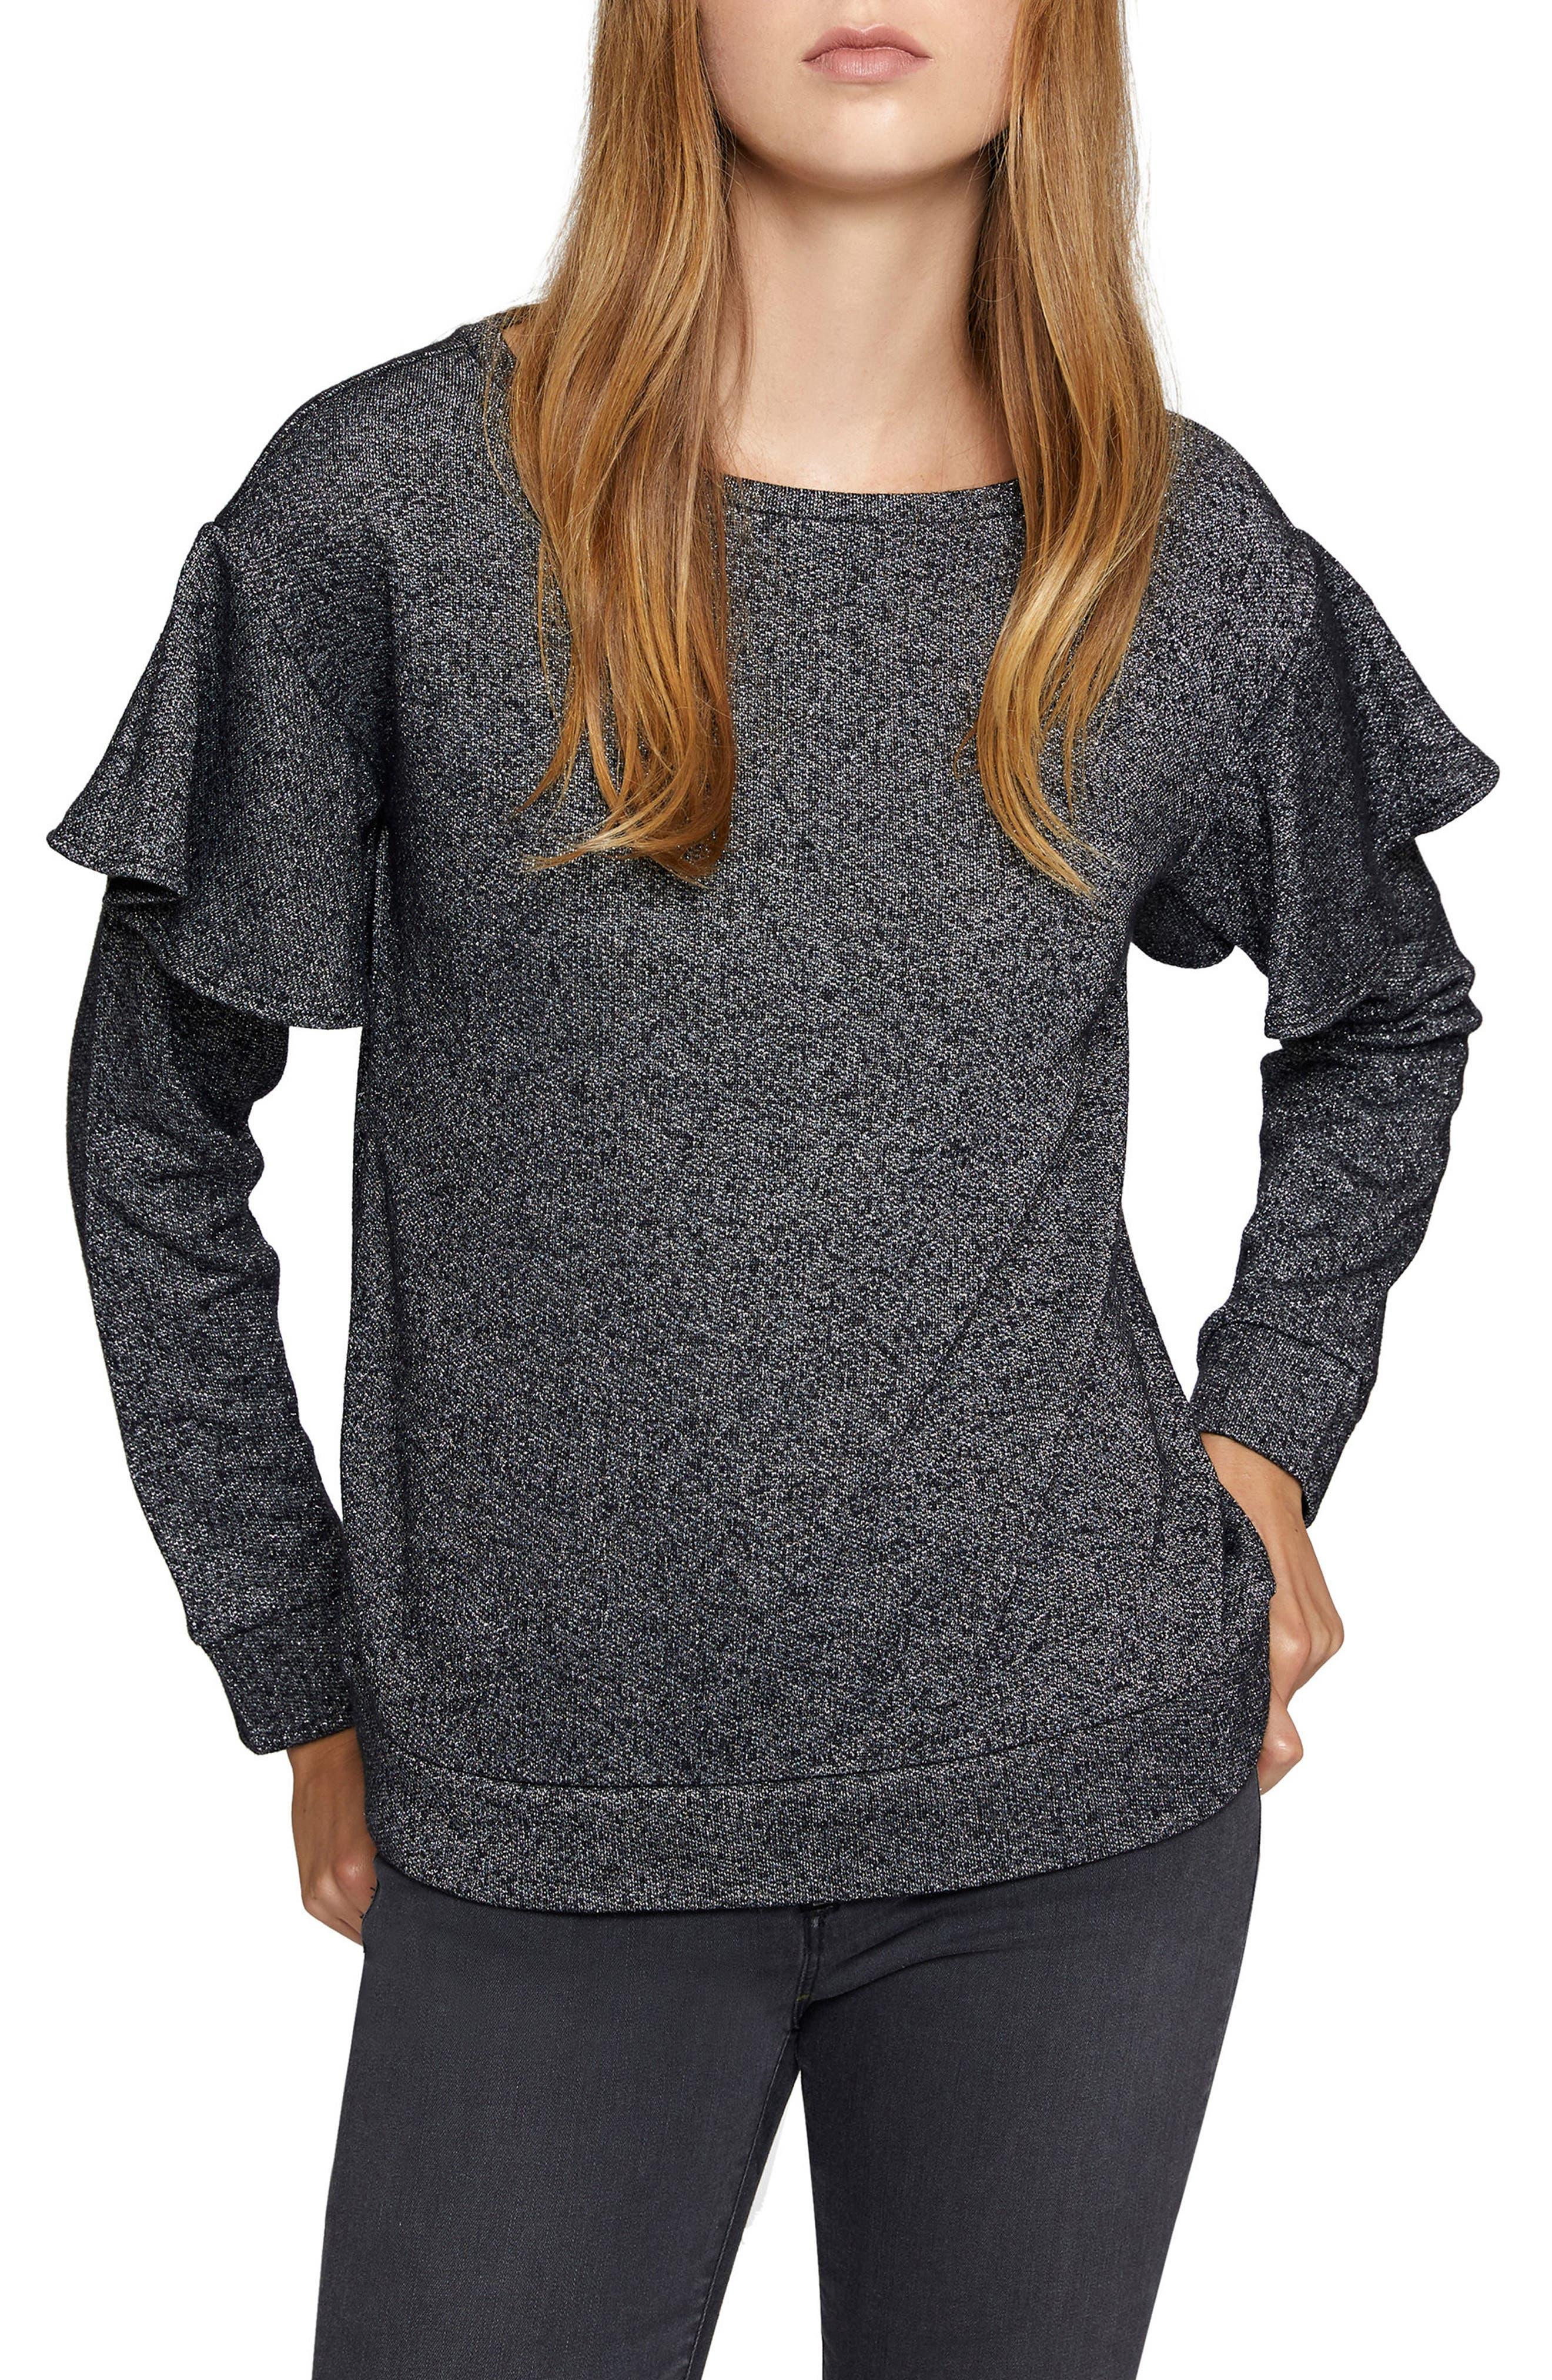 Dominique Metallic Sweatshirt,                         Main,                         color,